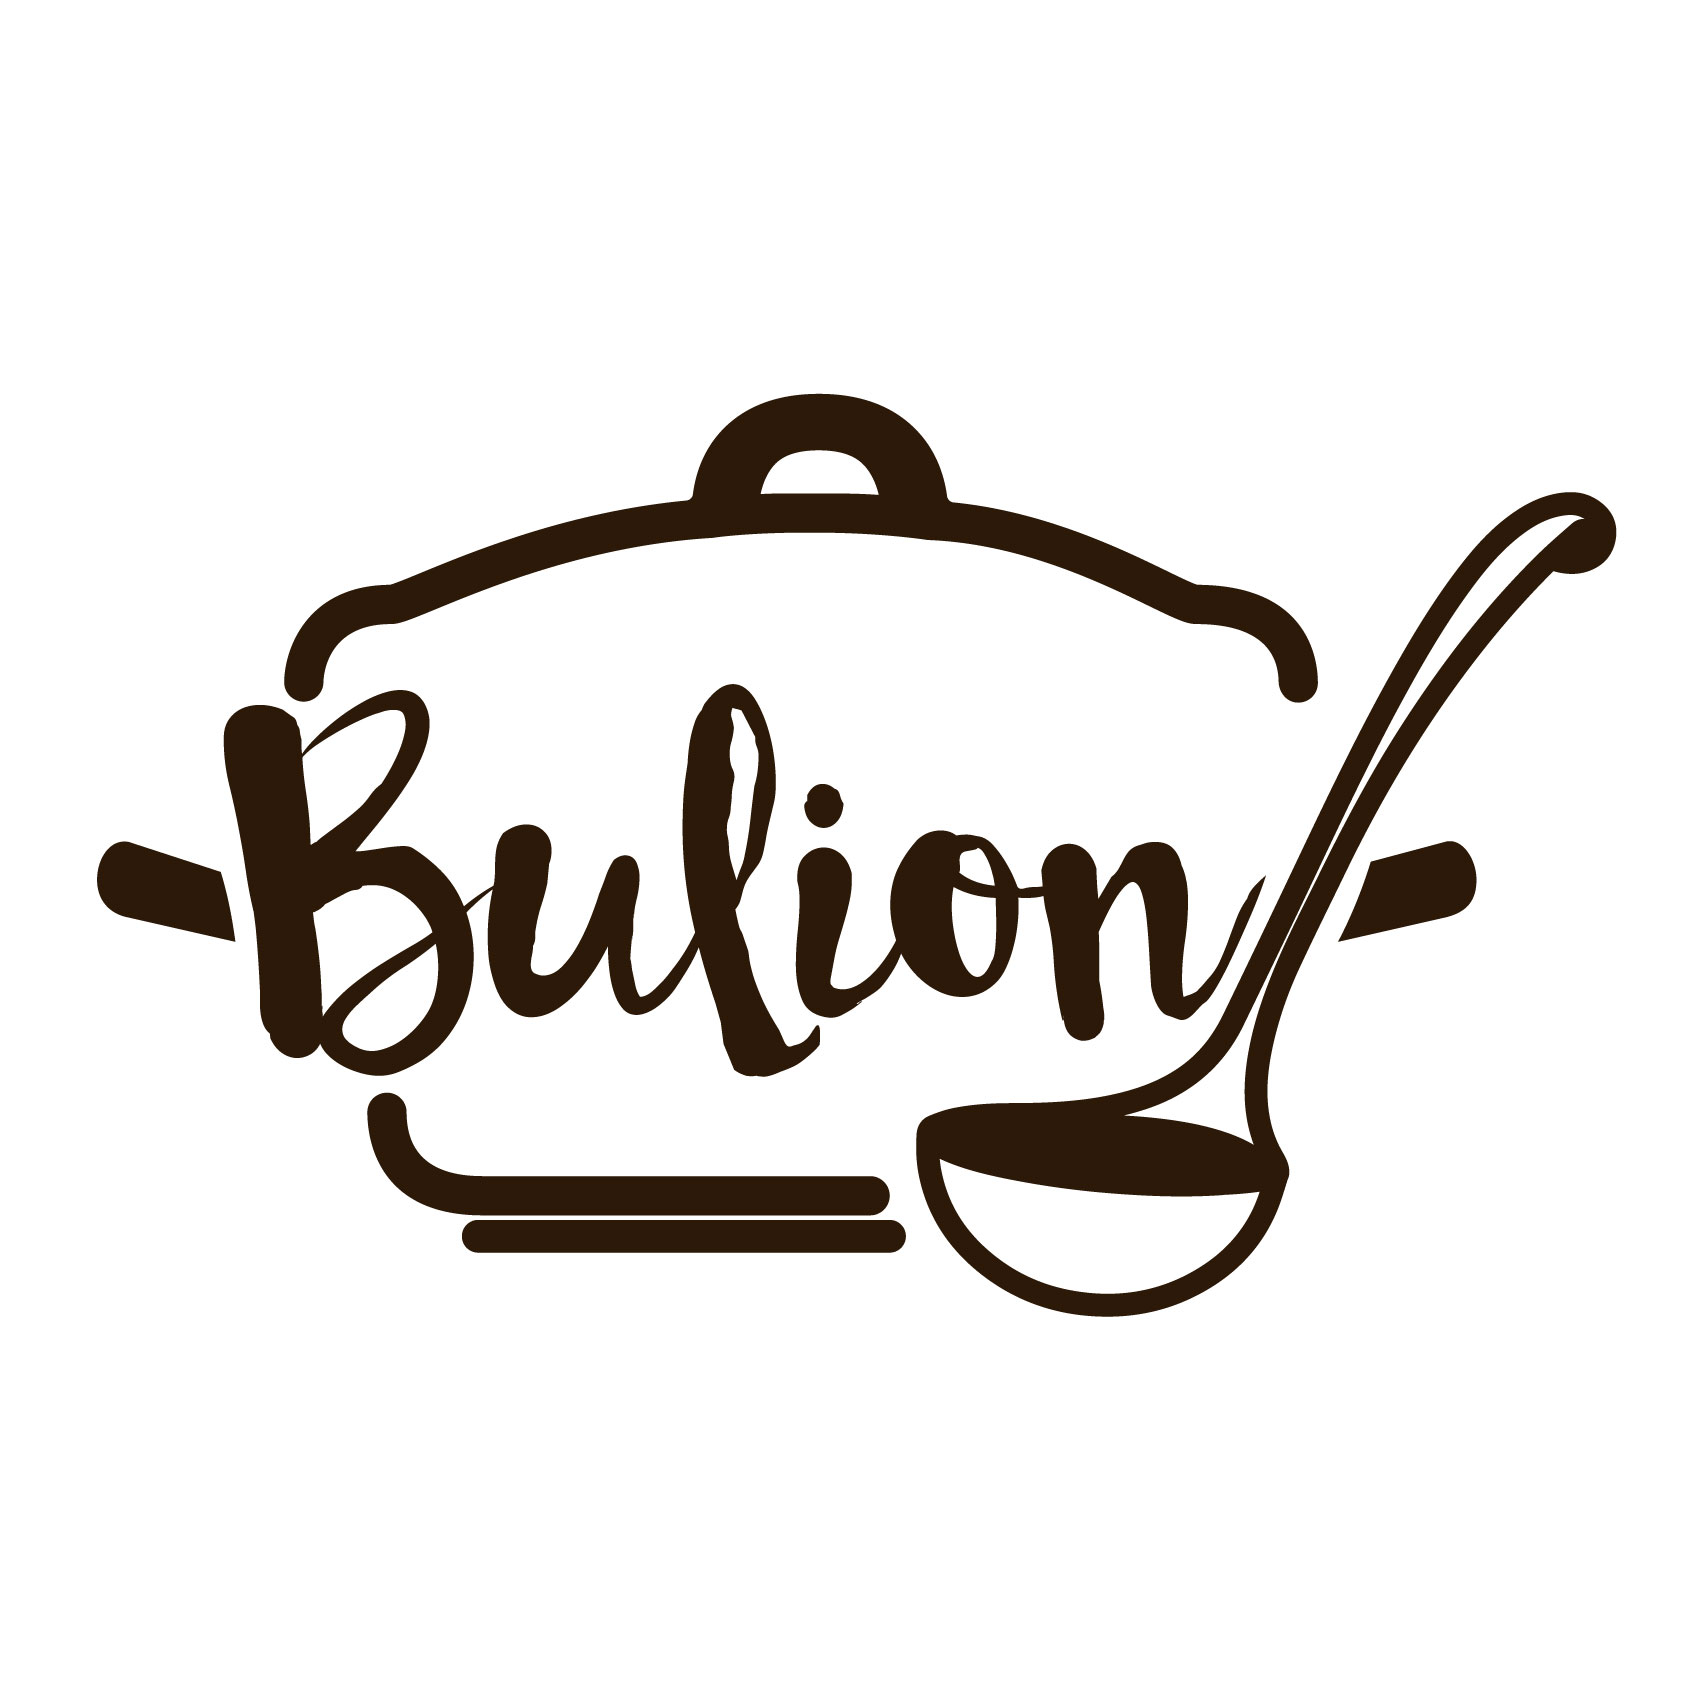 http://bulion.ua